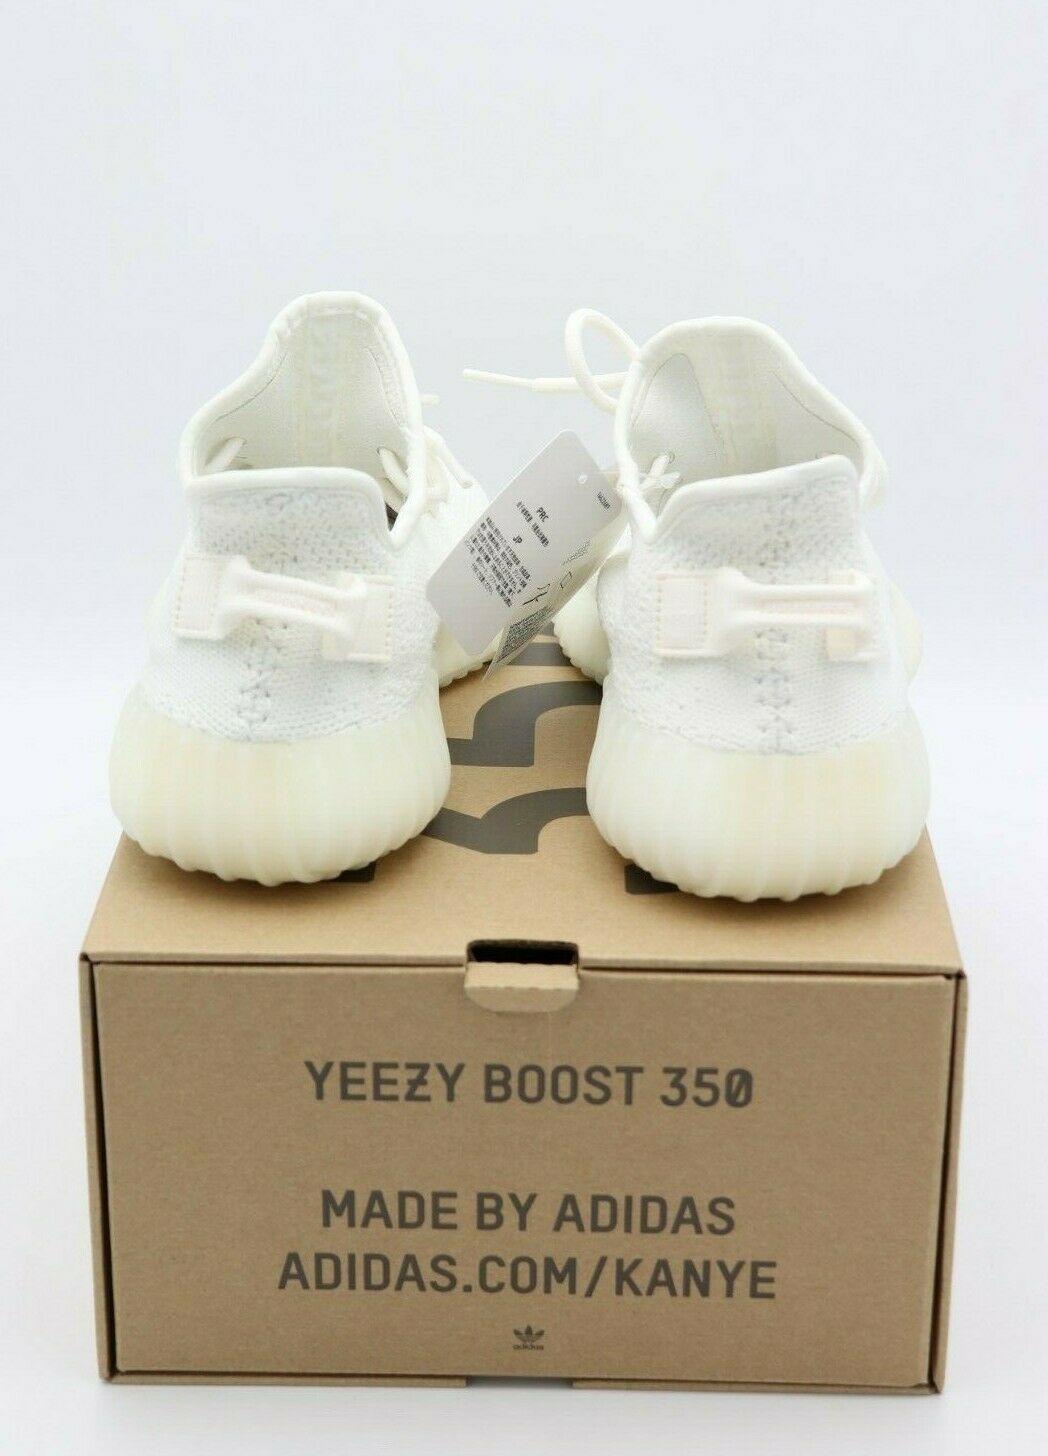 Neu in Box Adidas Yeezy Boost 350 V2 Triple Weiß Neu Größe 8 image 6